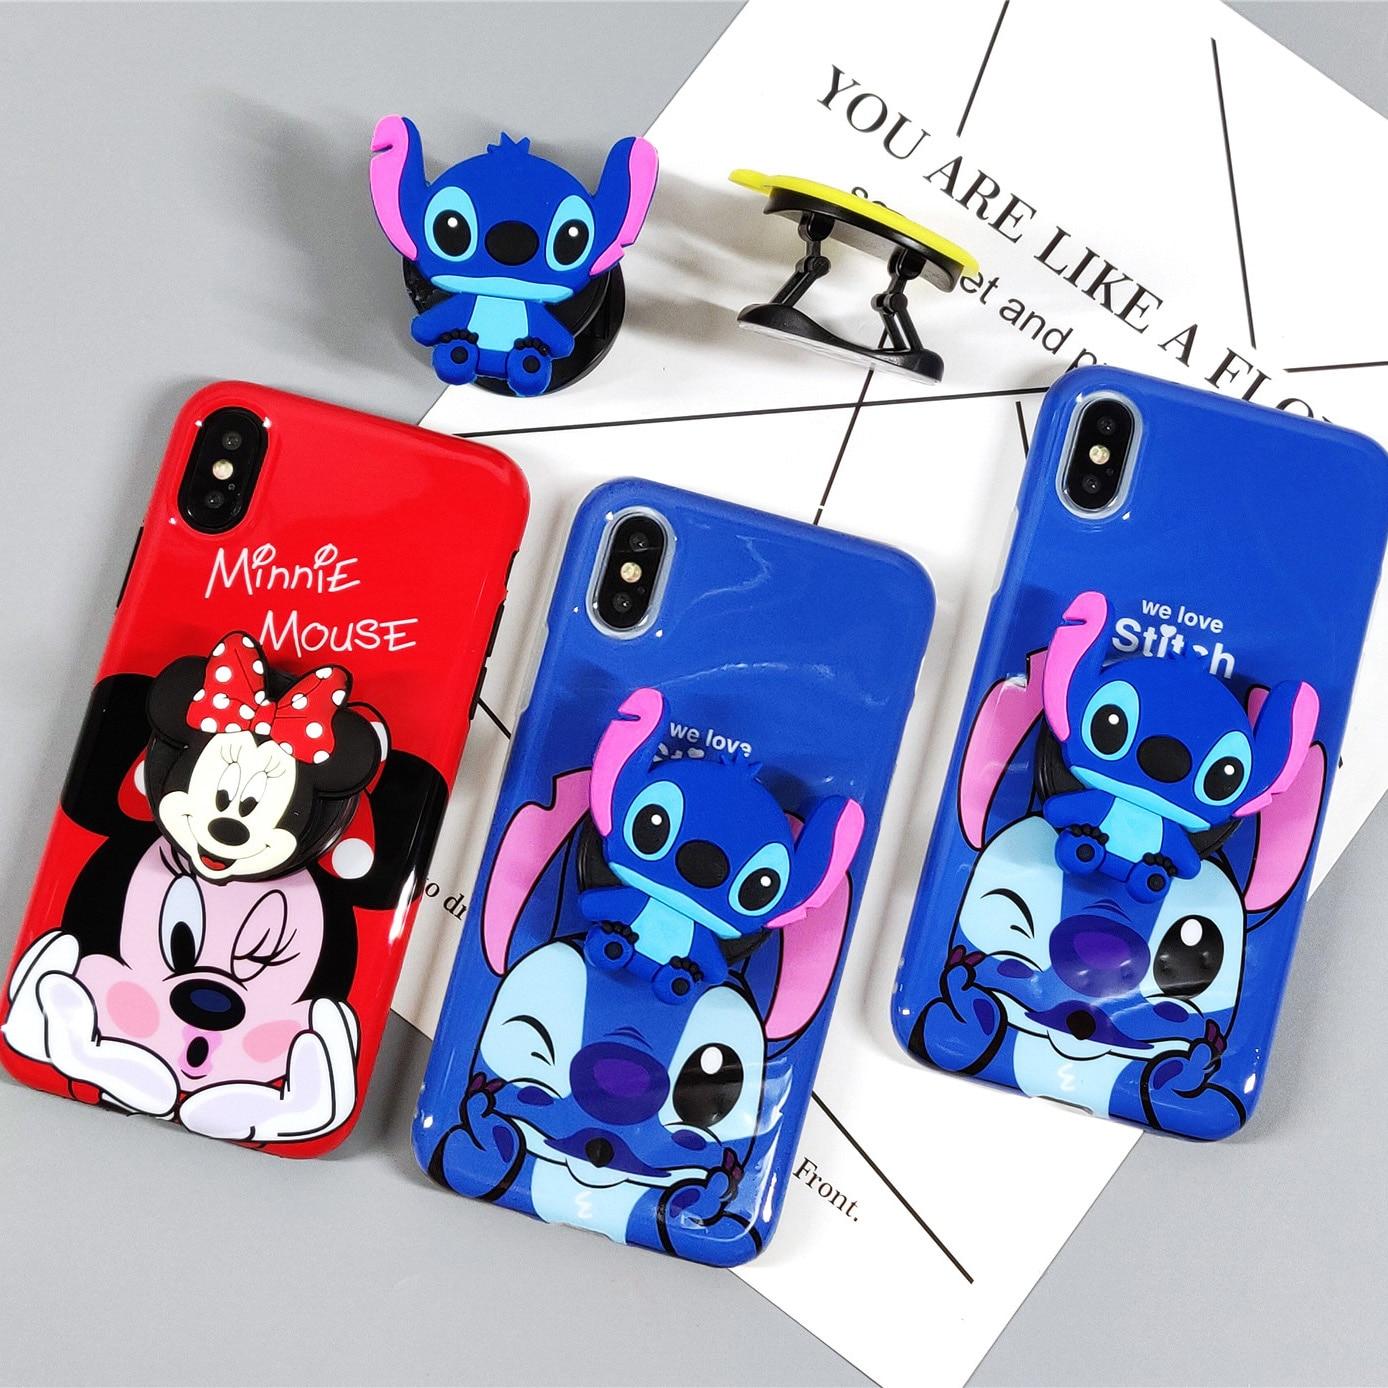 Cute 3D Minnie Stitch Cartoon Case for iphone 7 8 plus 6 6s plus Case 3D Grip Stand Phone Holder Case for iphone XS Max XR XS X